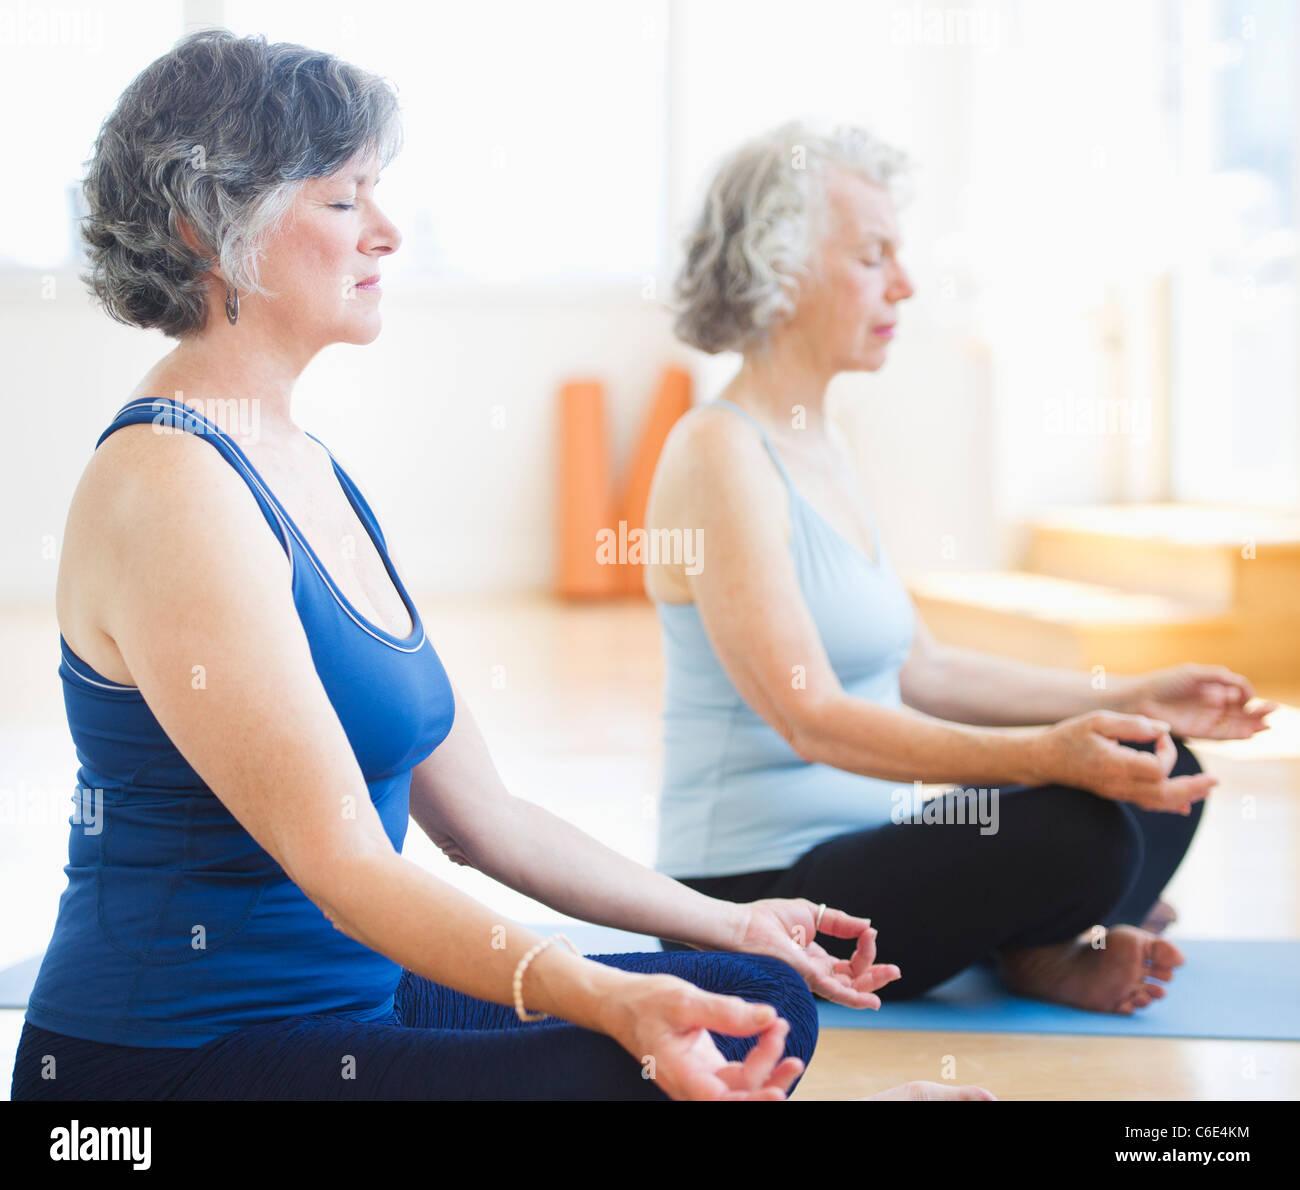 USA, New Jersey, Jersey City, zwei alte Frauen, Yoga zu praktizieren Stockbild